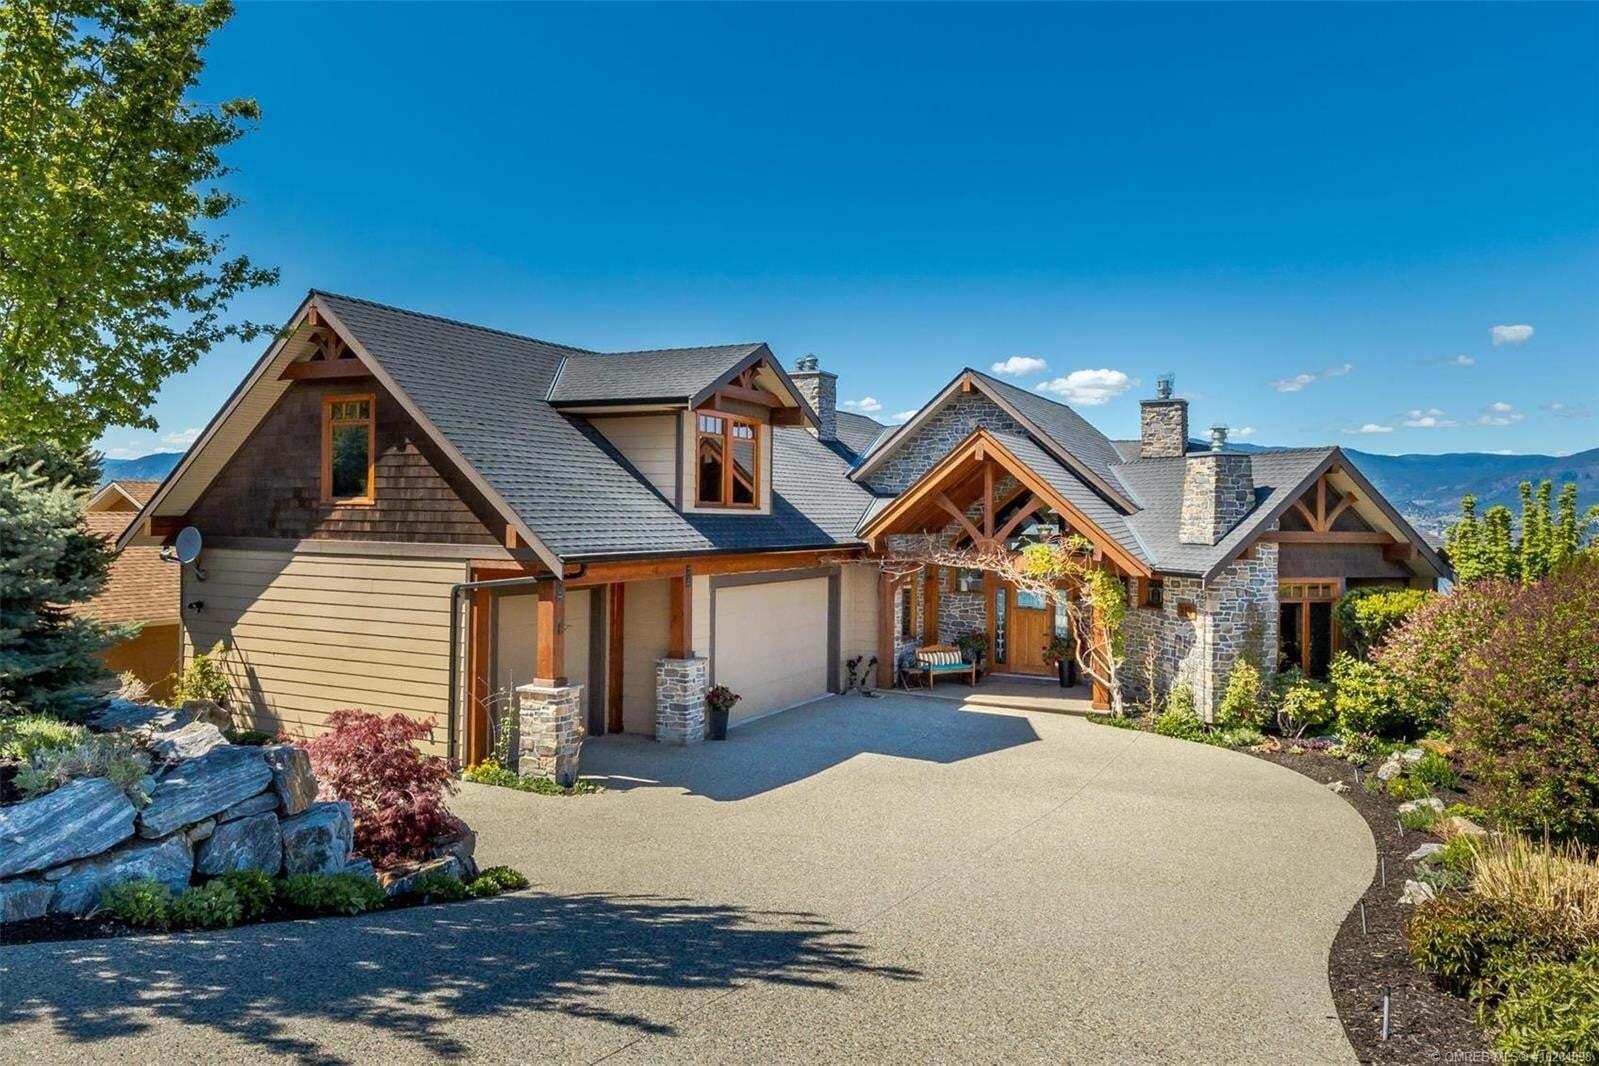 House for sale at 414 Okaview Rd Kelowna British Columbia - MLS: 10204898